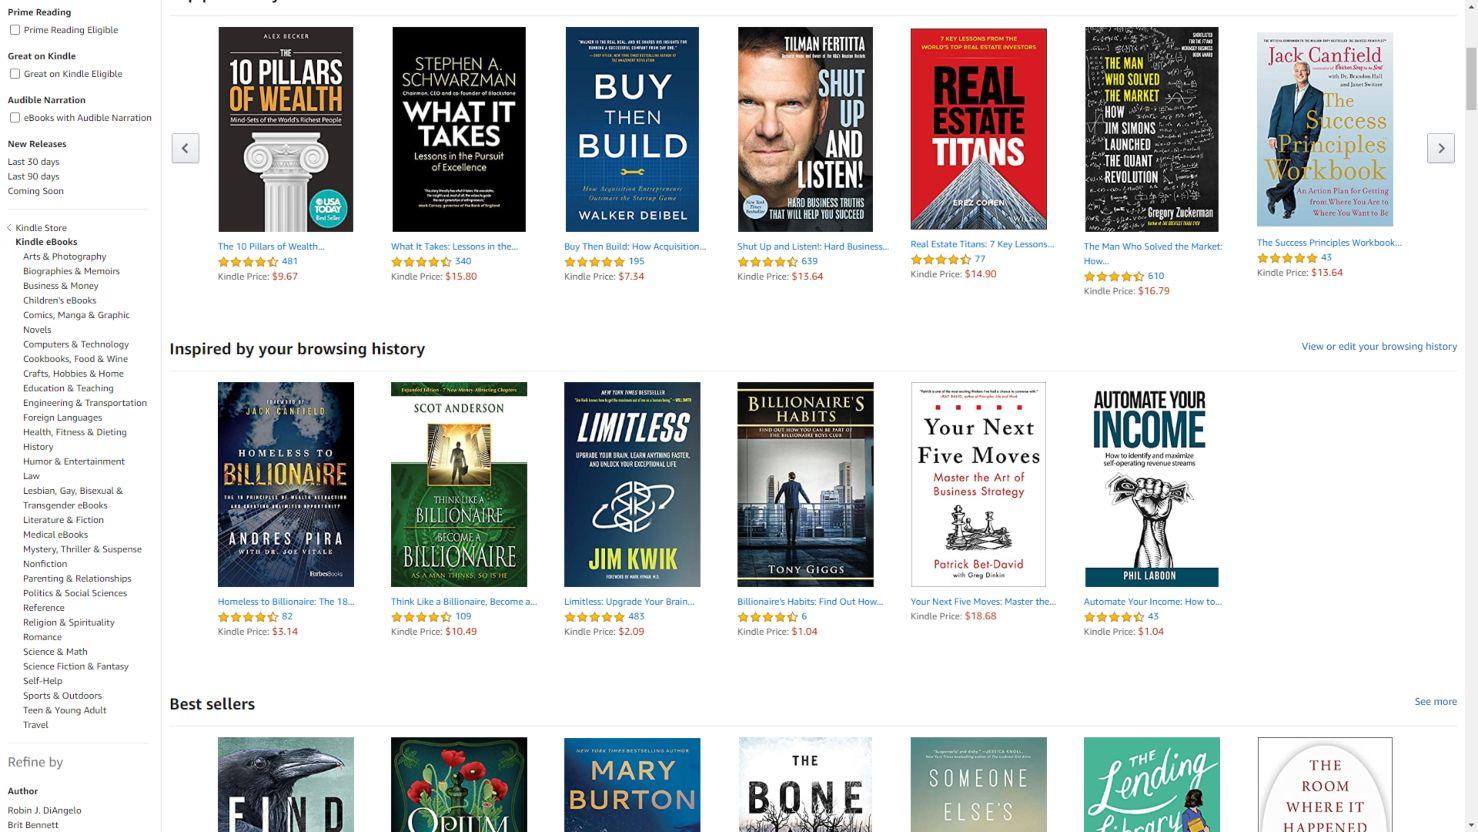 Kategorie książek oraz bestsellery w Kindle Store